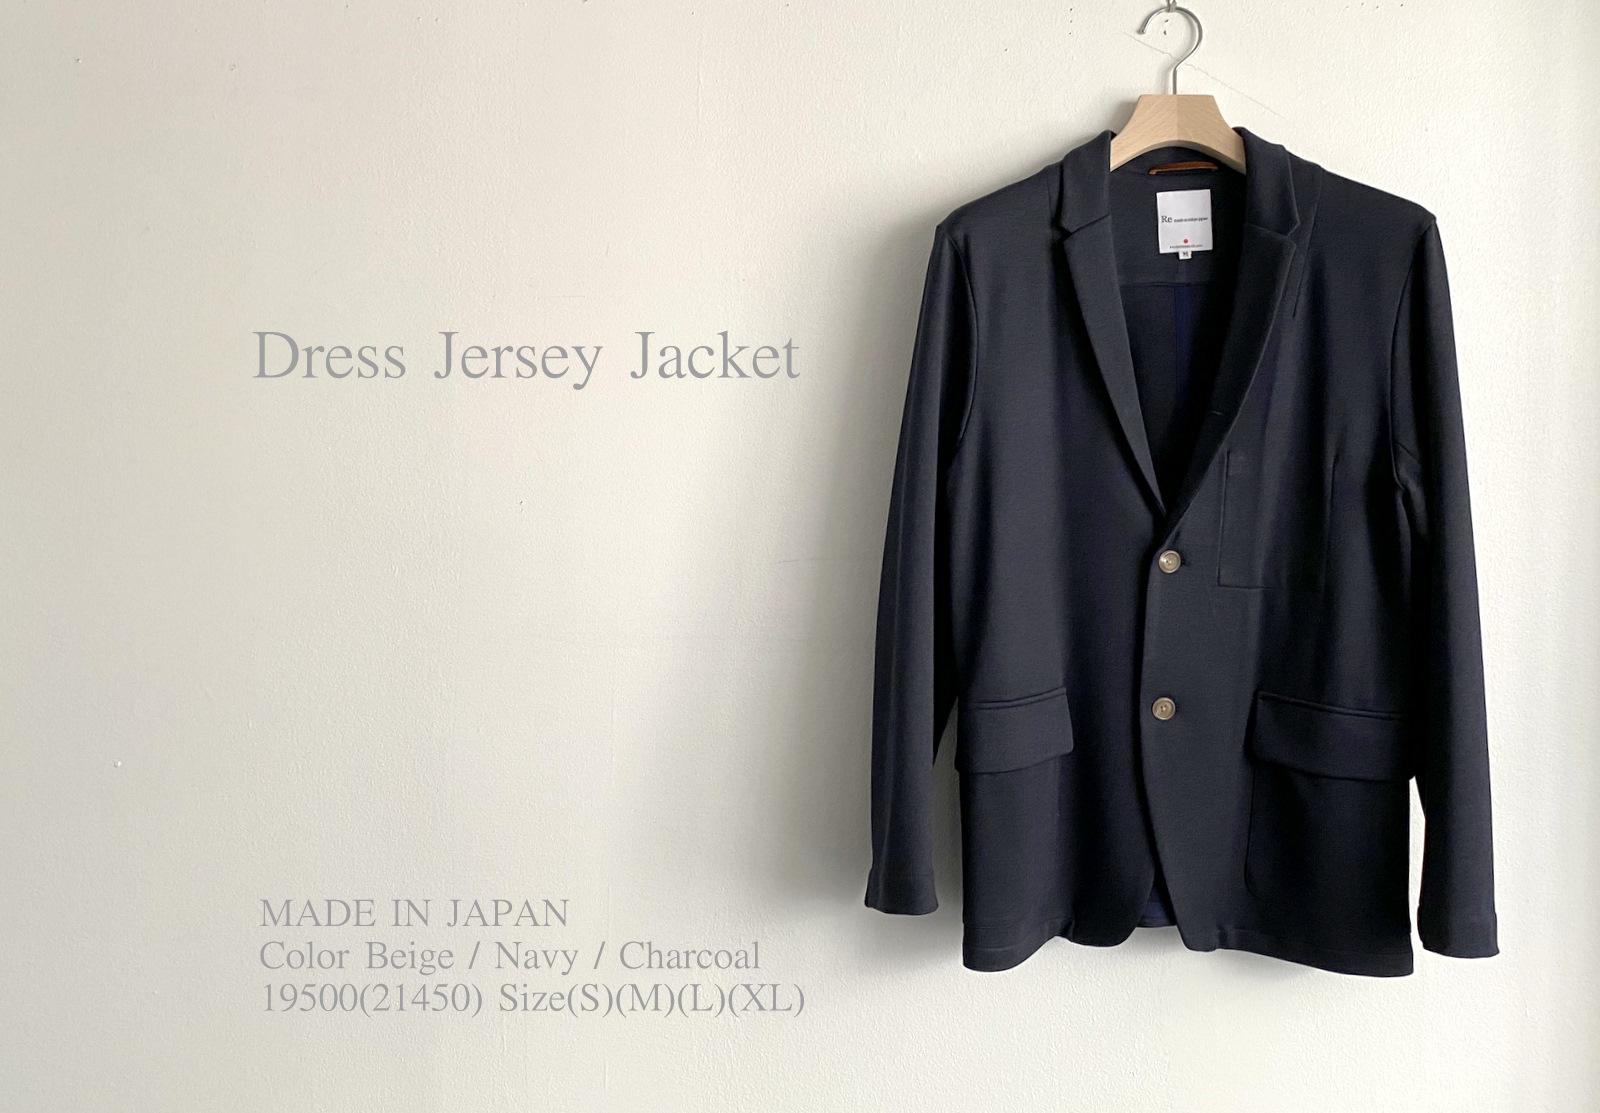 Dress Jersey Jacket_c0379477_17101863.jpg